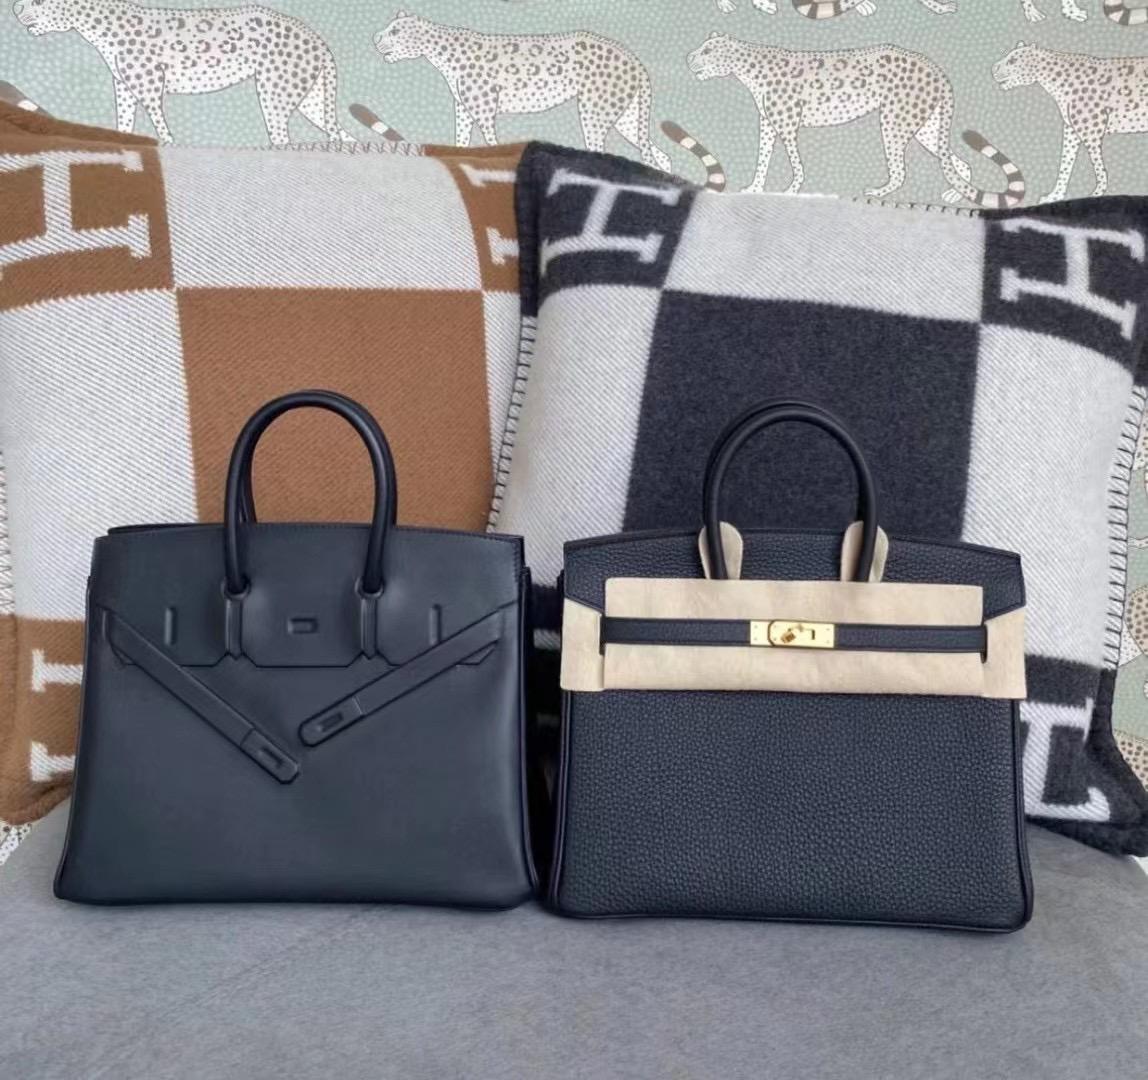 愛馬仕幻影價格 Saudi Arabia Hermes Birkin 25 Shadow Swift 89 Noir 黑色